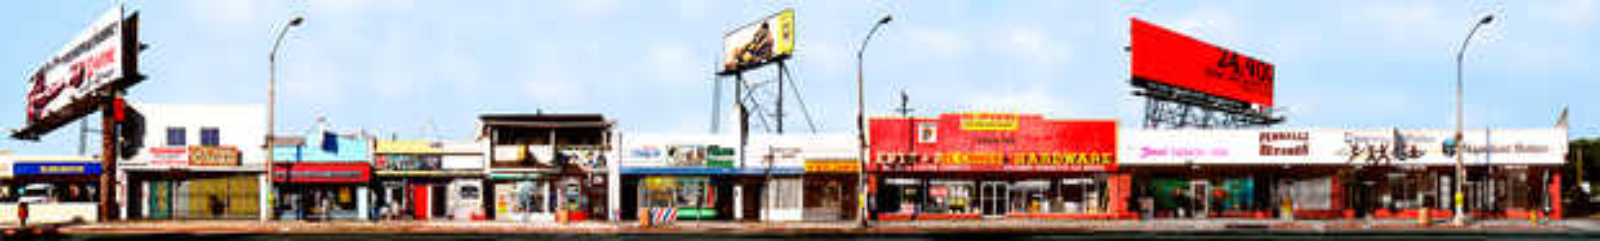 Crenshaw Boulevard #1, LA - Larry Yust